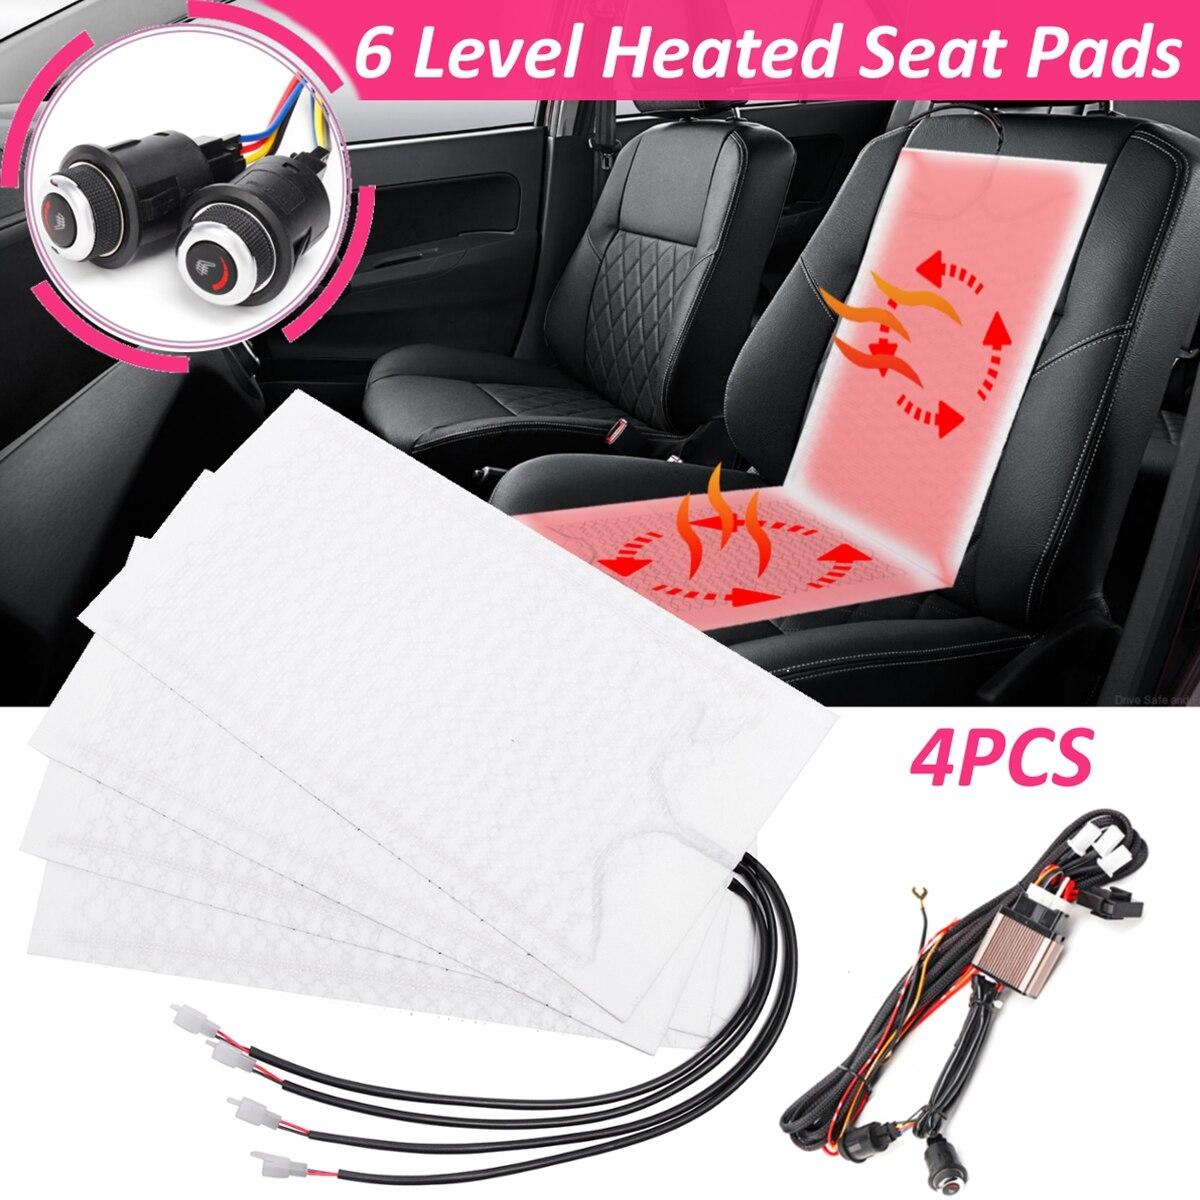 4Pcs Universal Car Seat Heater Pad Set Carbon Fiber Auto Seat Heating Mat Kit with Round Switch 12V